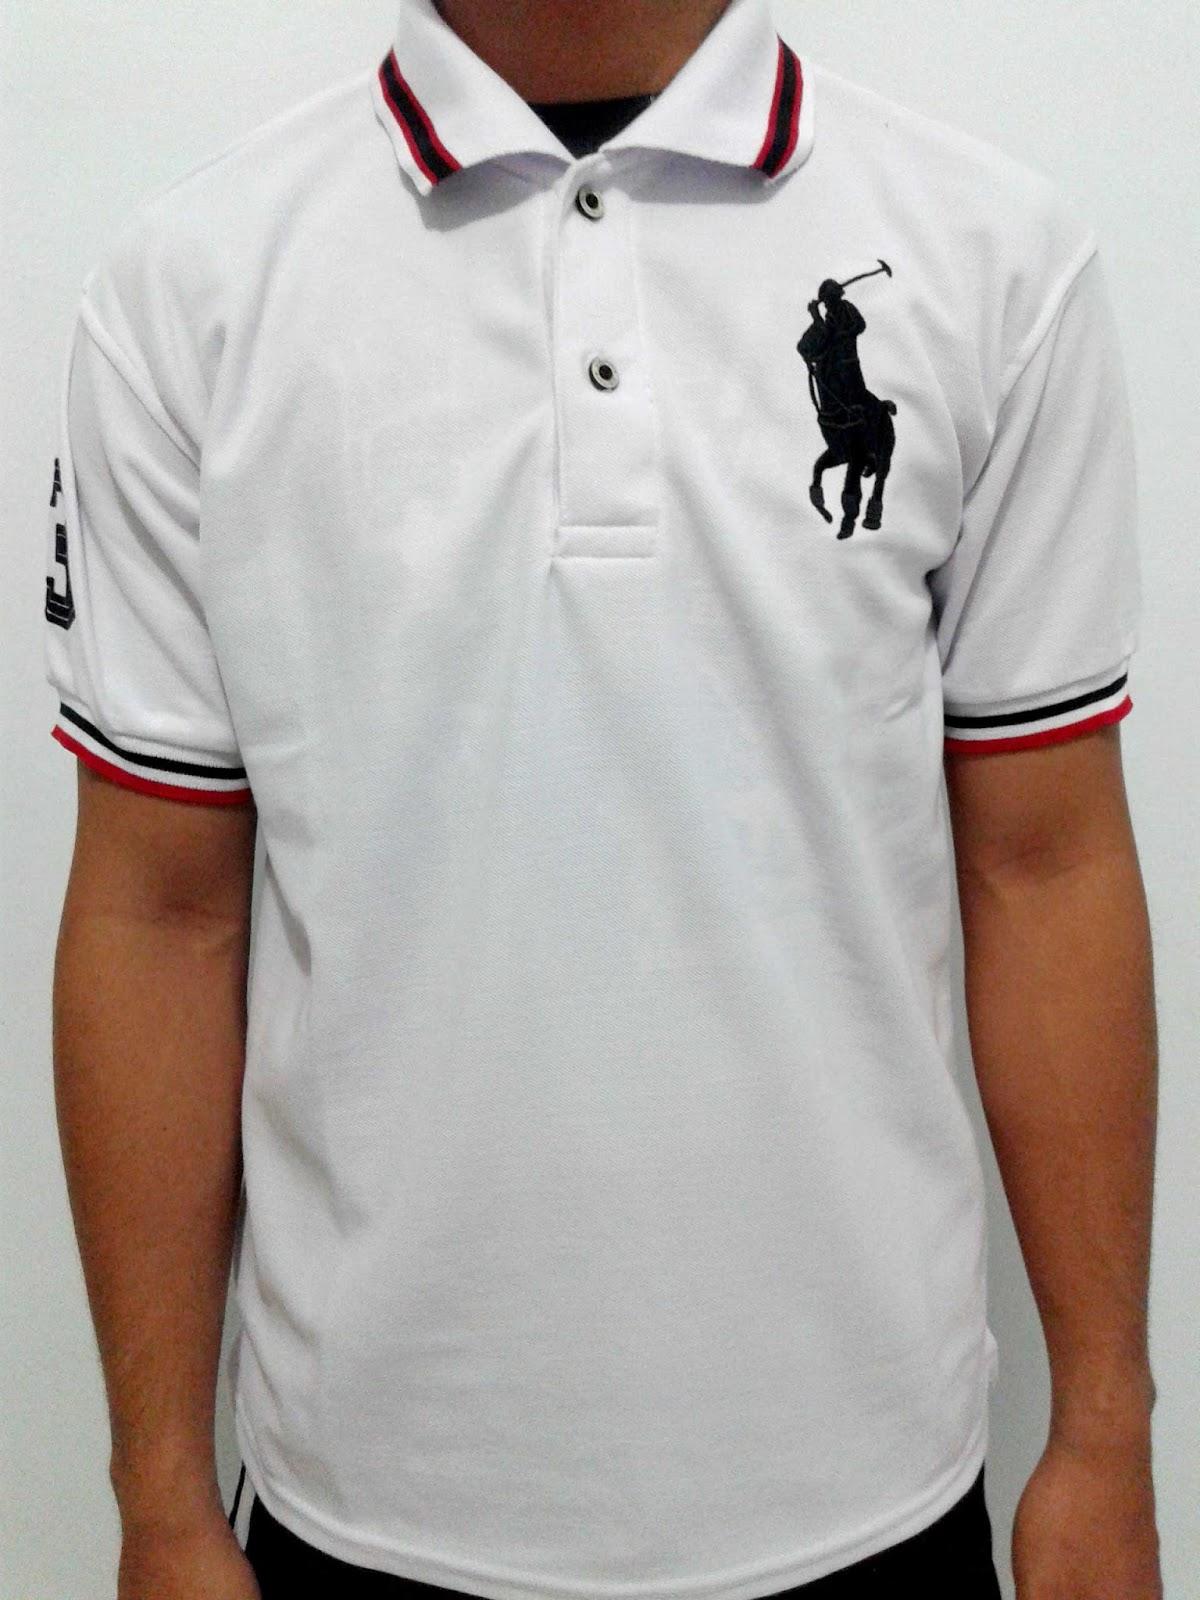 Tag  Harga T Shirt Polo Ralph Lauren Indonesia adc64769a8e8